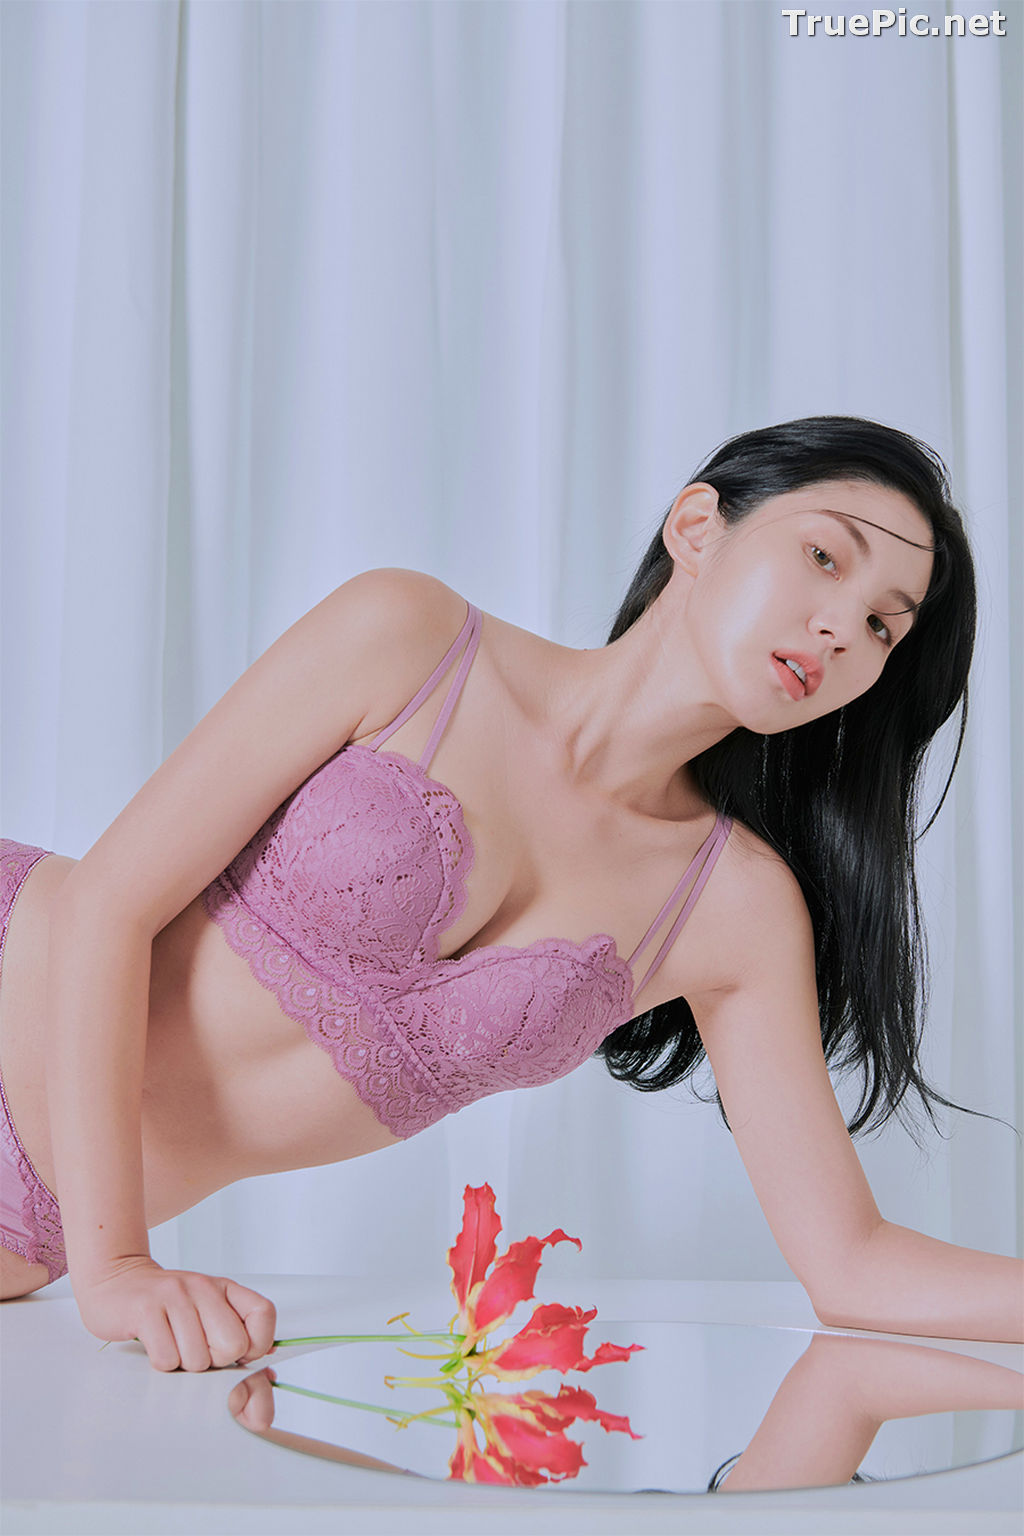 Image Korean Fashion Model – Lee Chae Eun (이채은) – Come On Vincent Lingerie #4 - TruePic.net - Picture-1